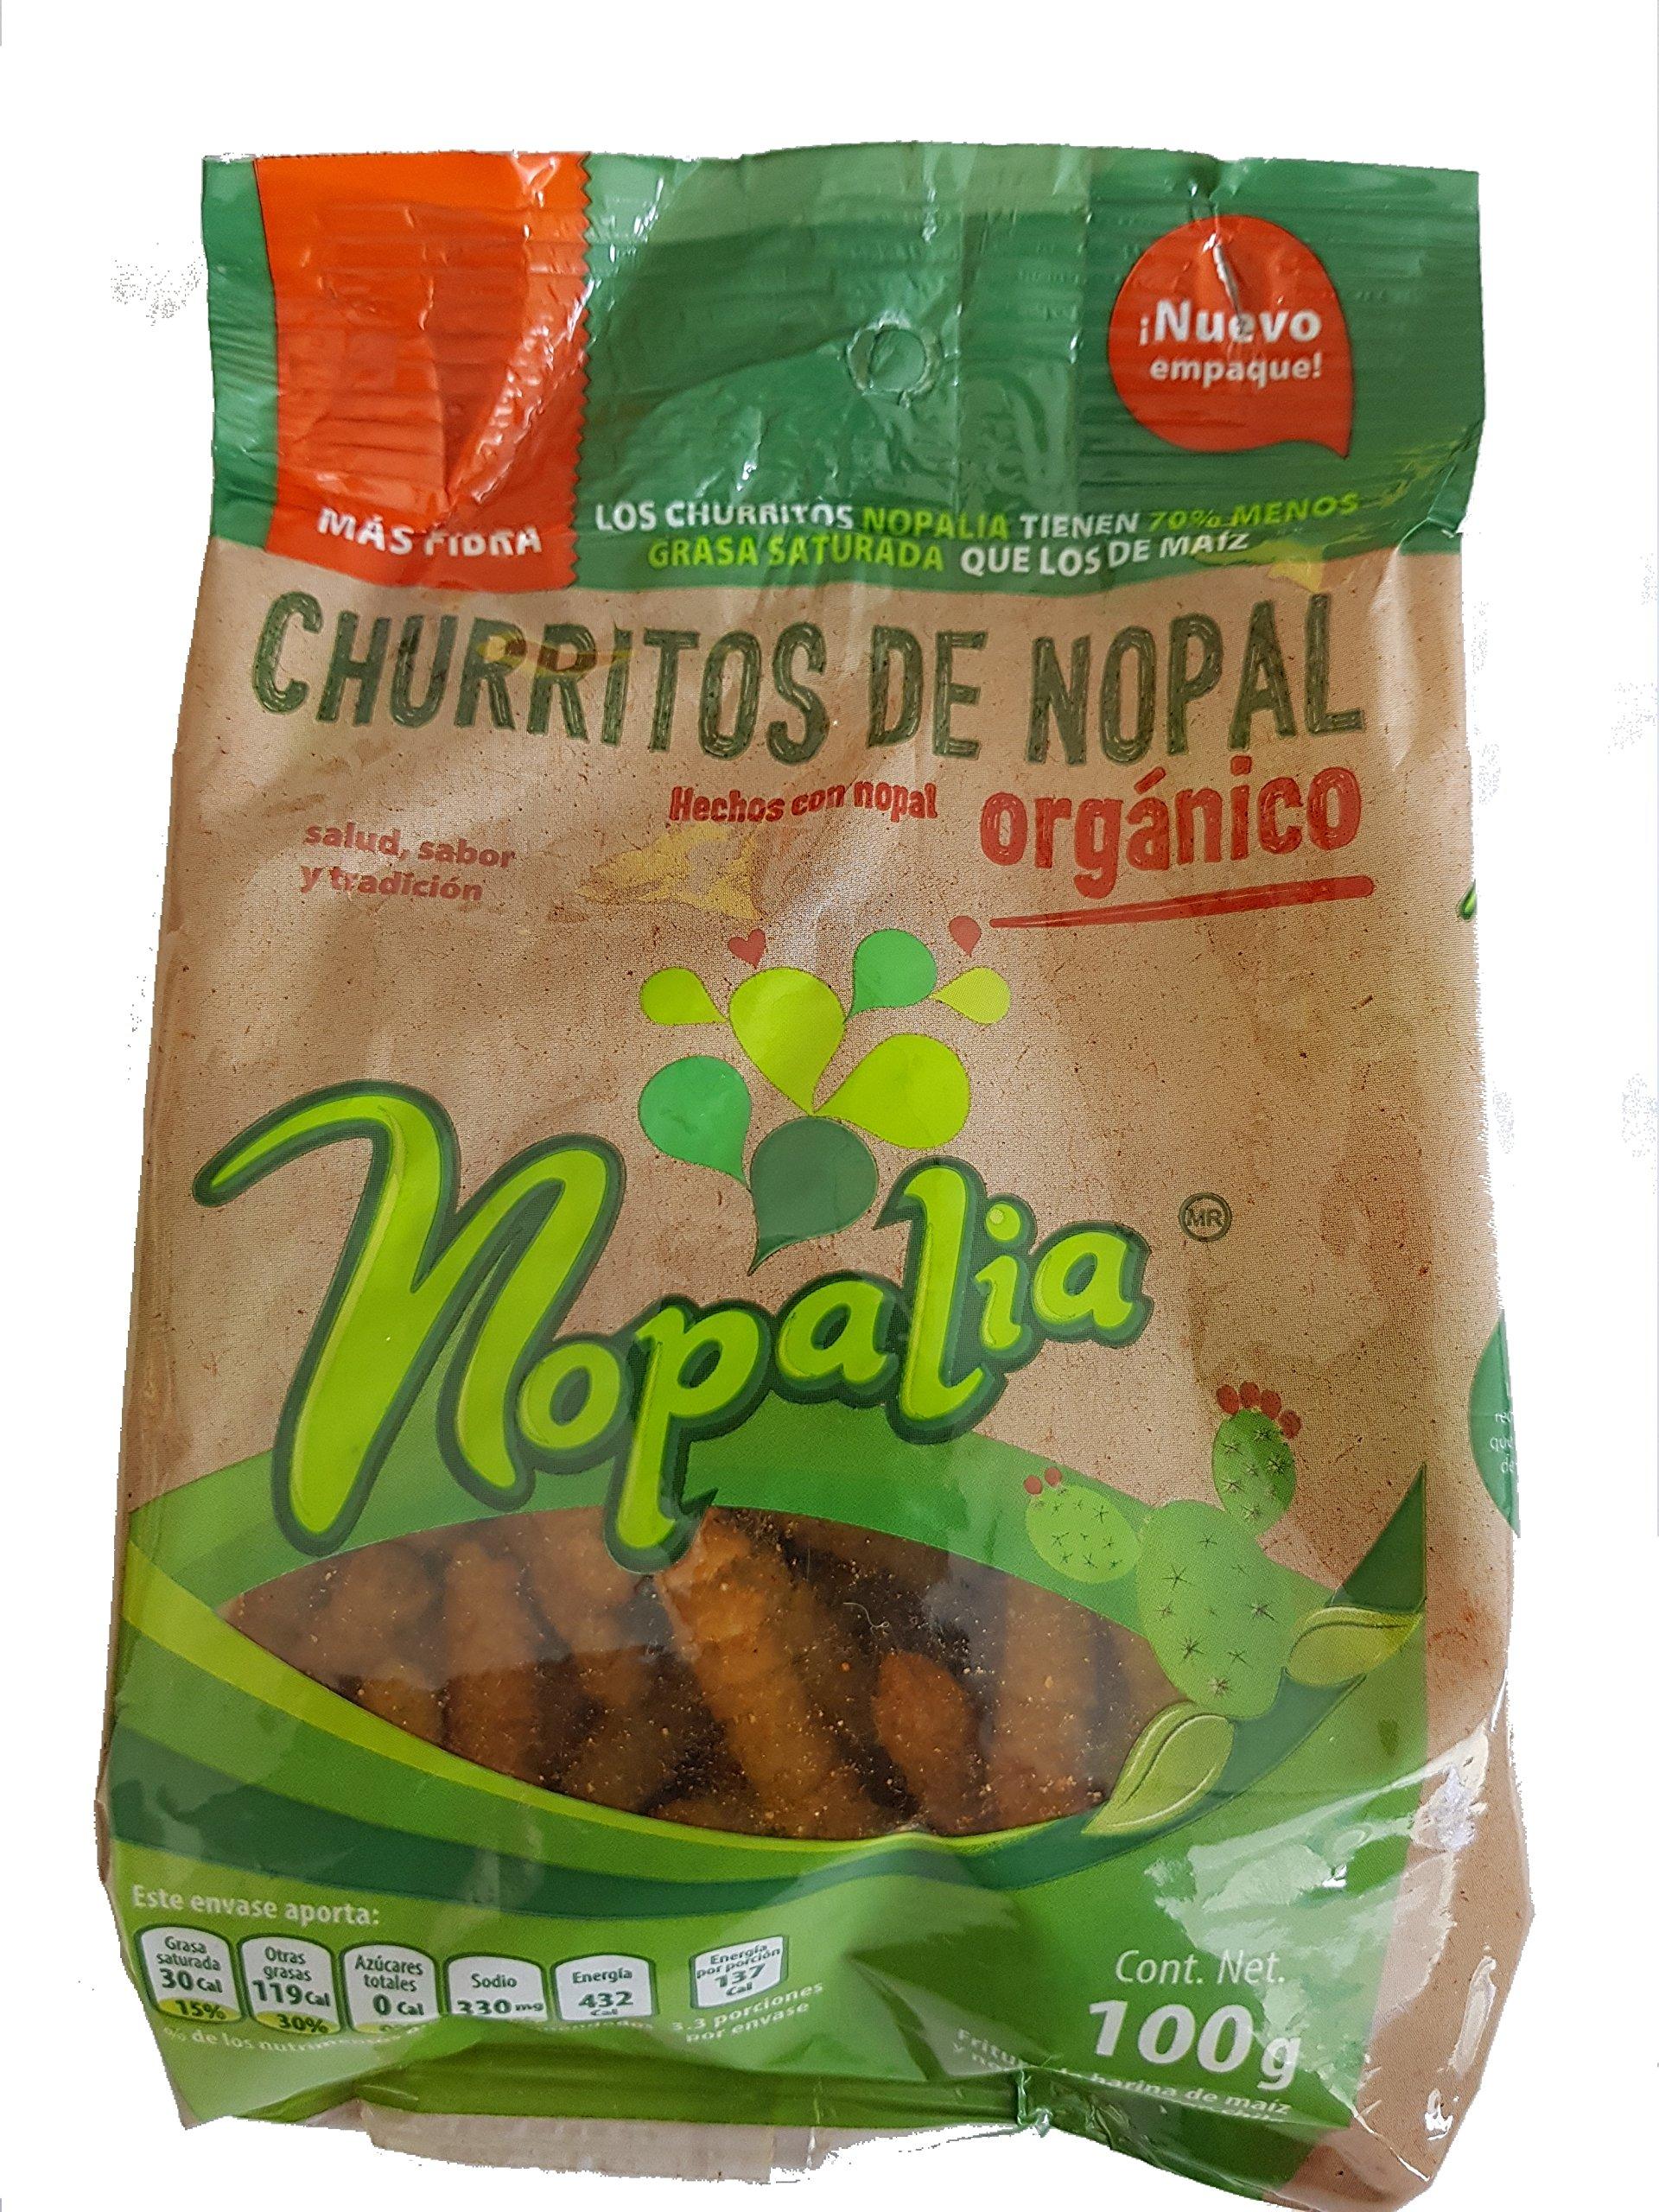 Cactus churritos - Churritos de Nopal